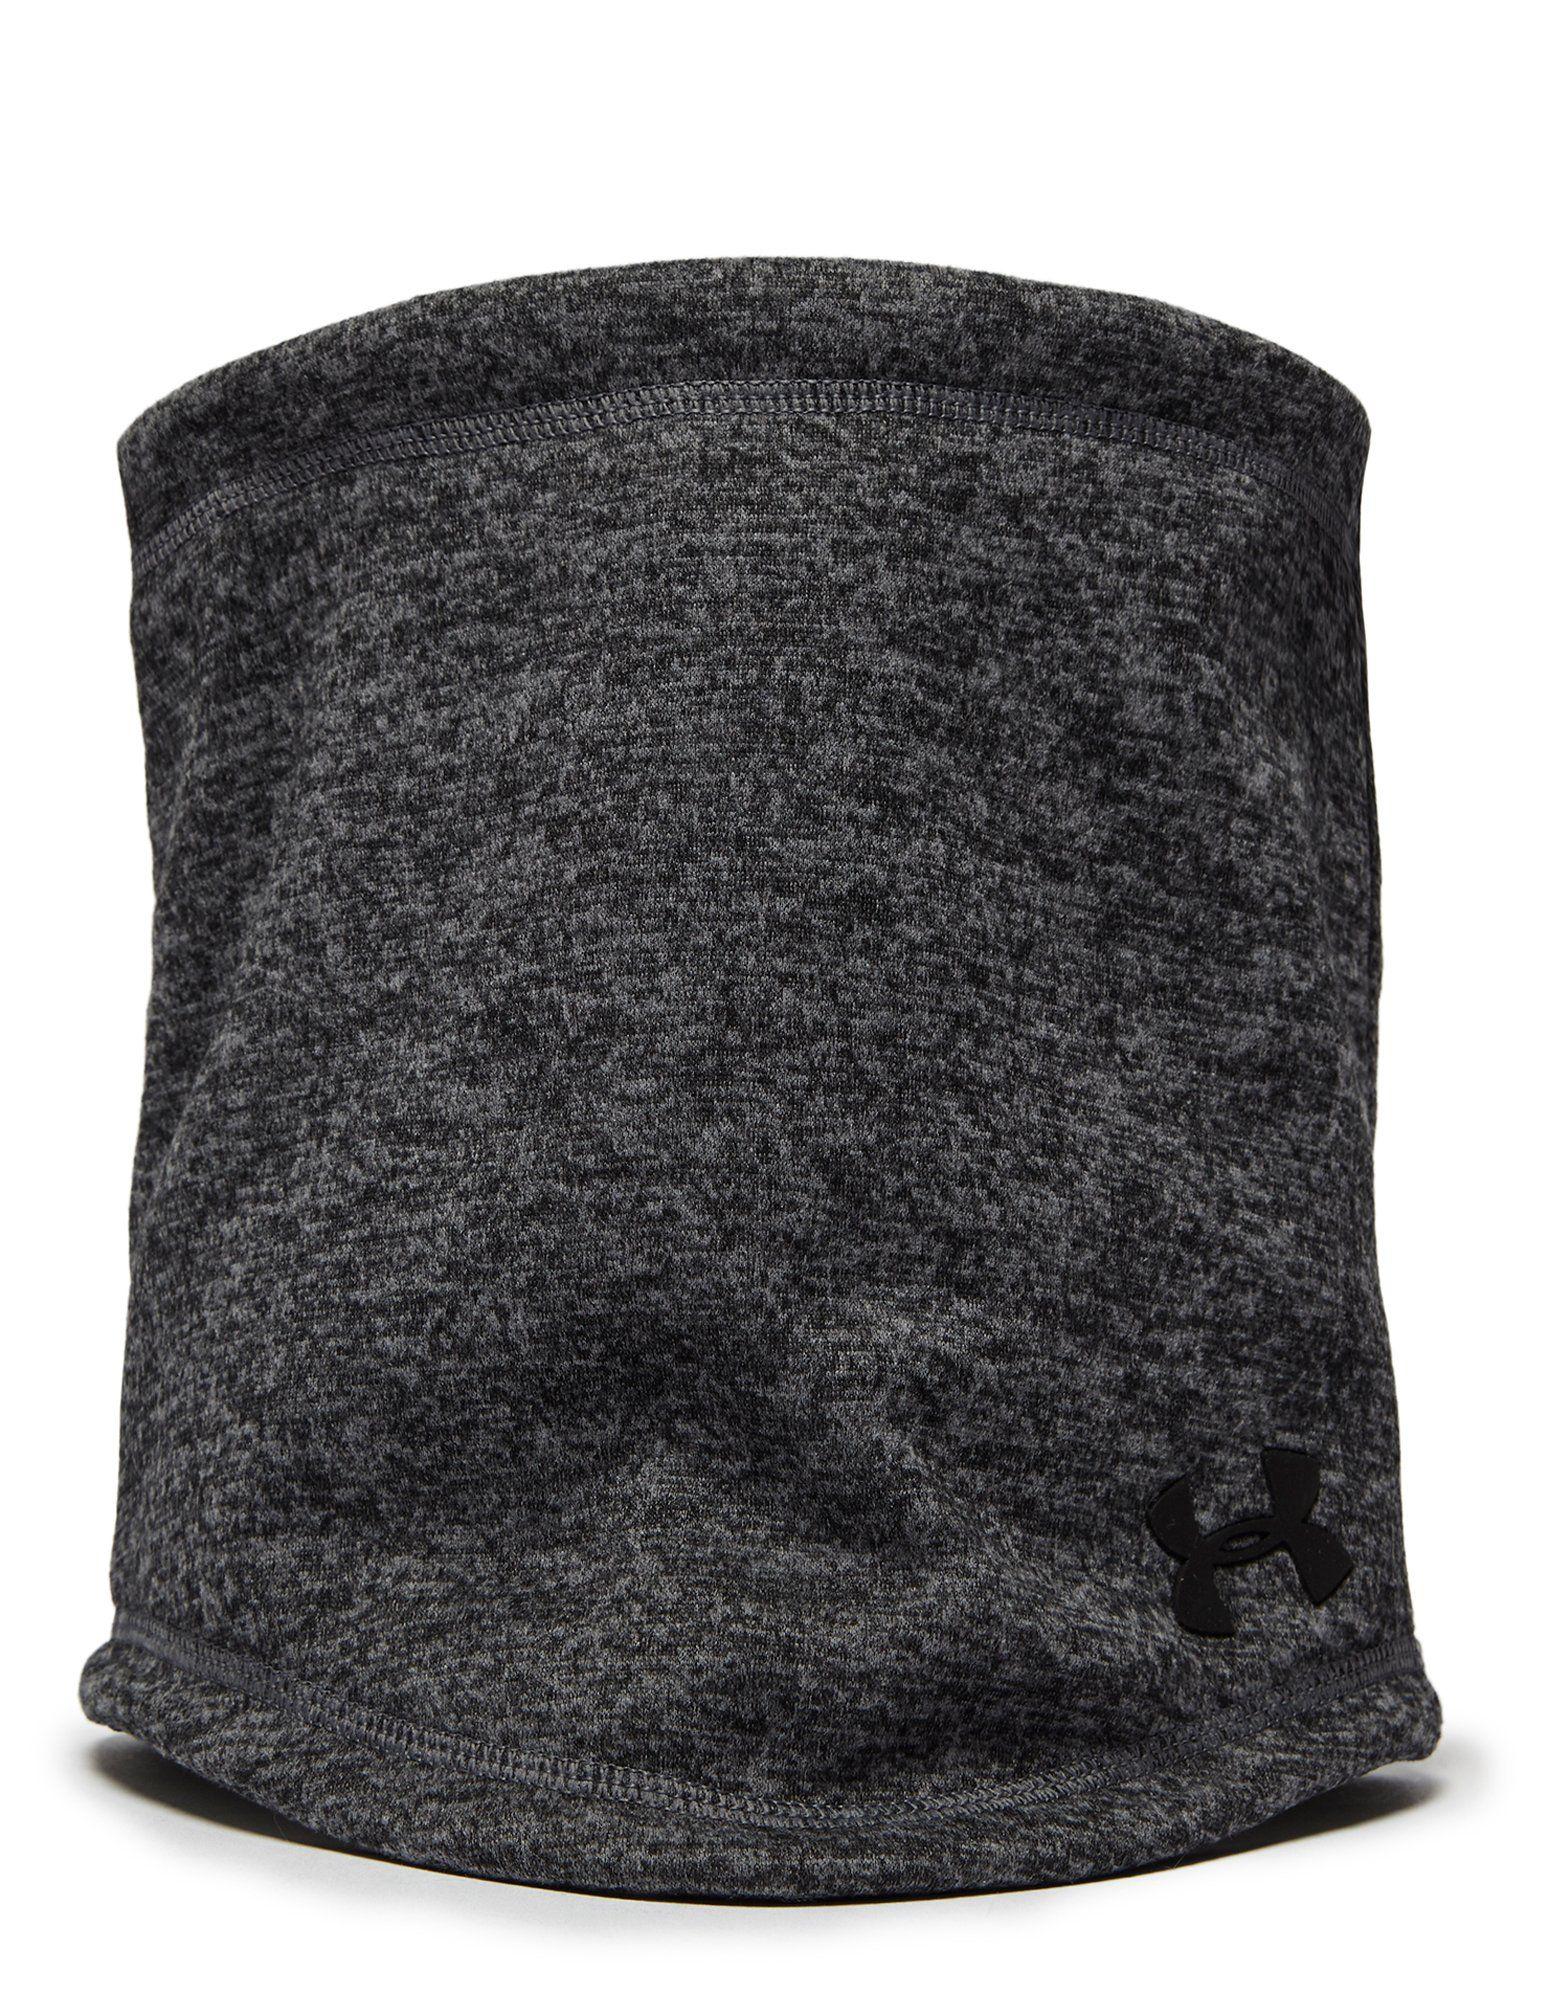 Leather gloves mens jd - Under Armour Elements Fleece Neck Gaiter